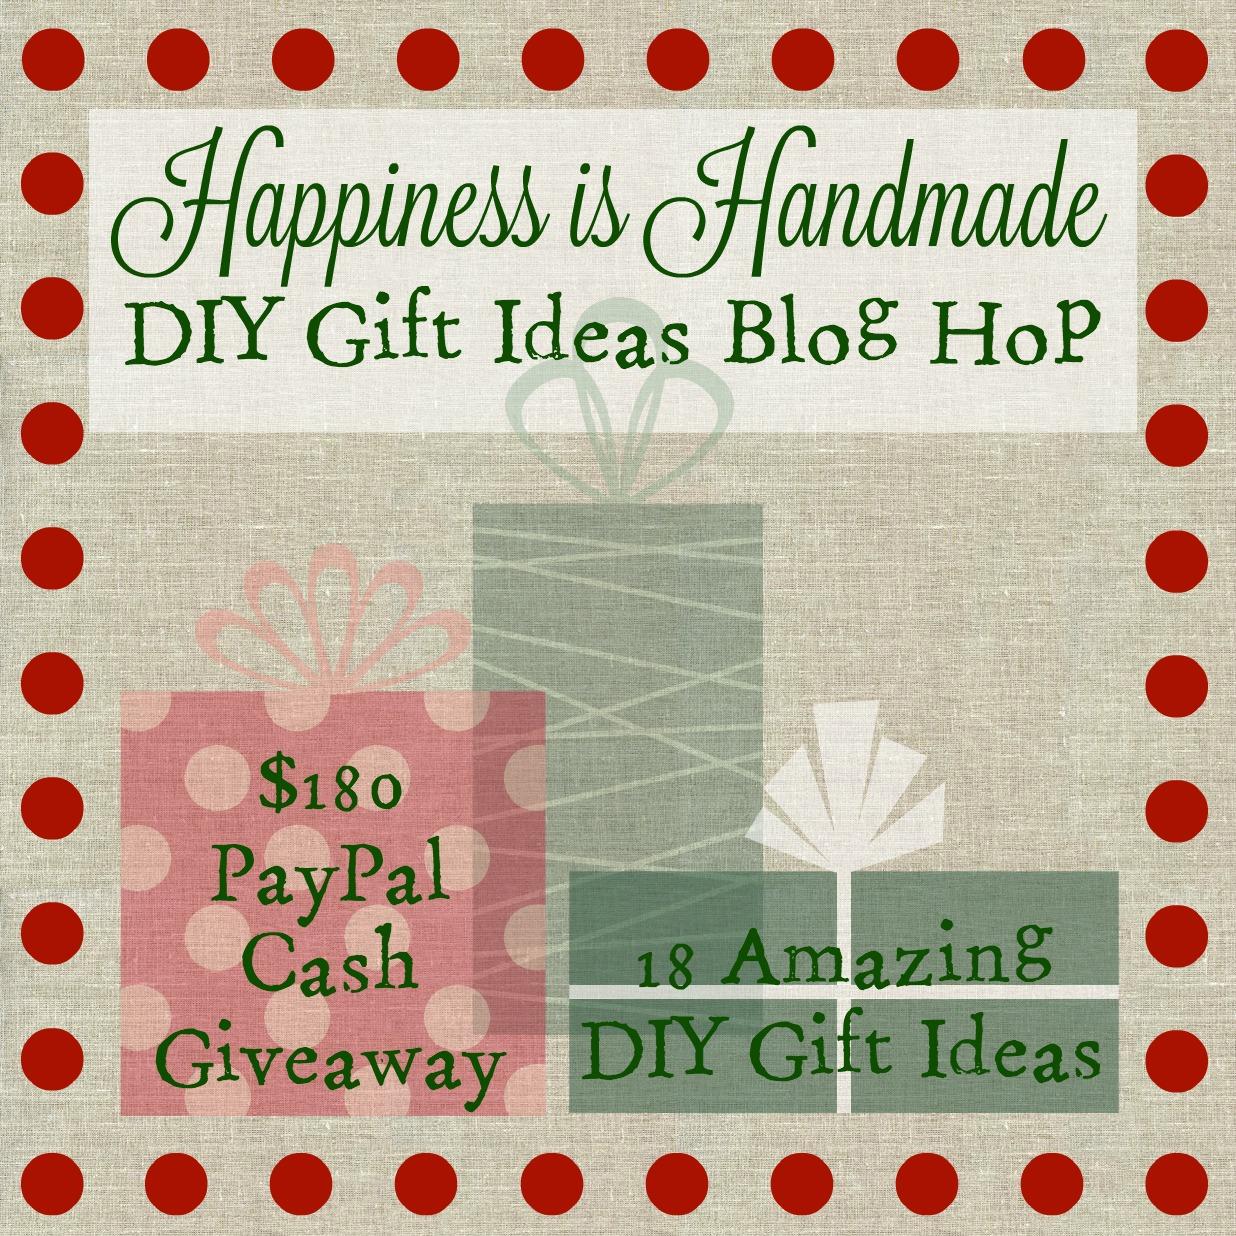 Happiness is Handmade DIY Gift Ideas Blog Hop 2015